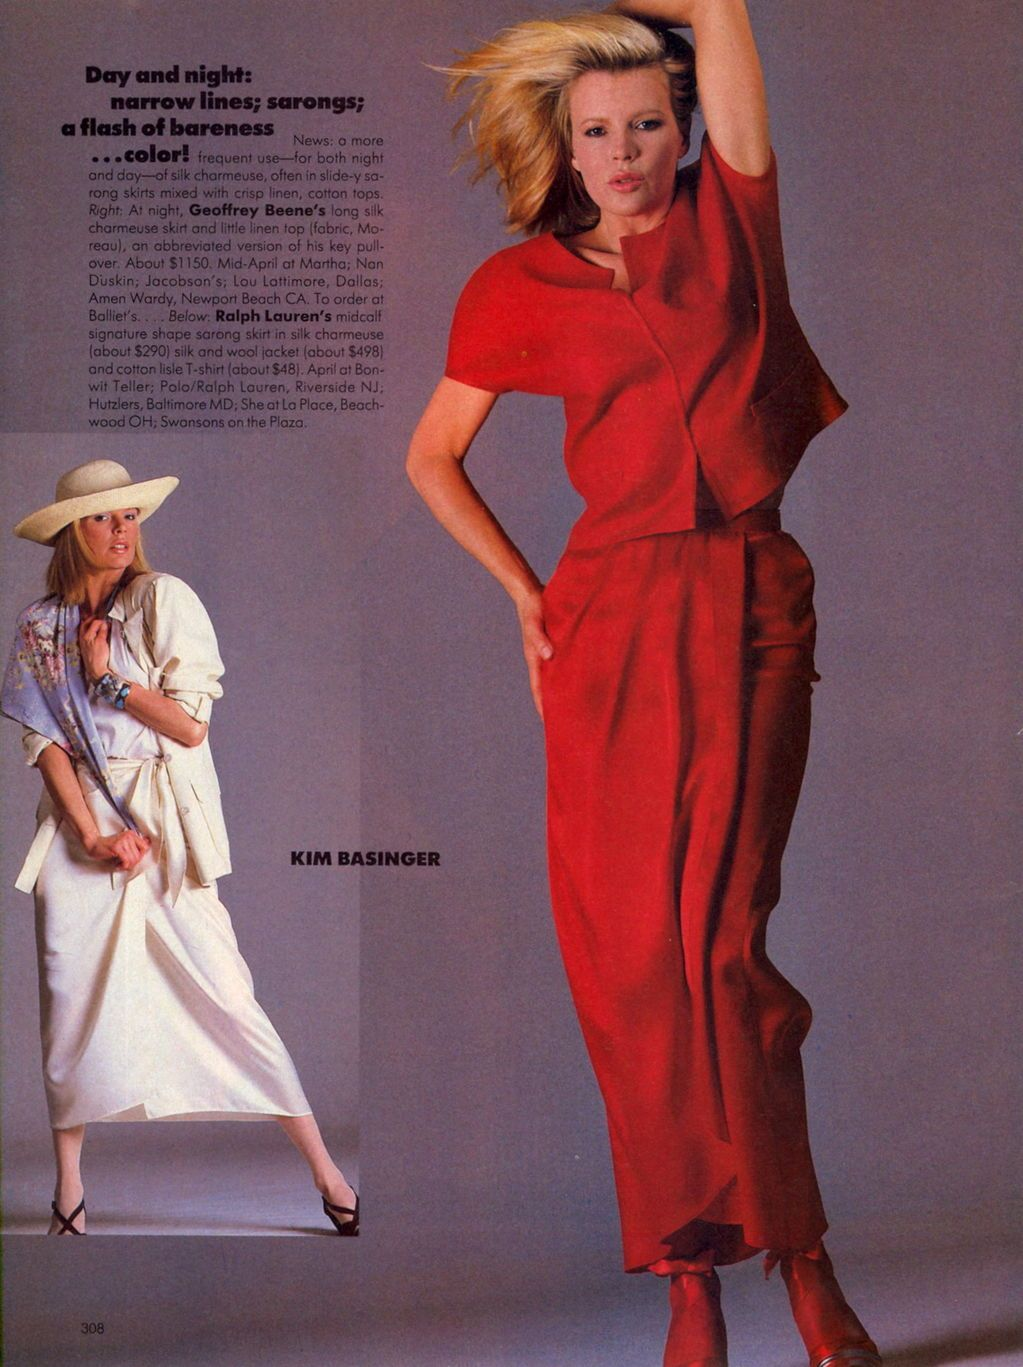 Kim Basinger For Vogue 1983: Kim Basinger For Vogue 1983 In 2019